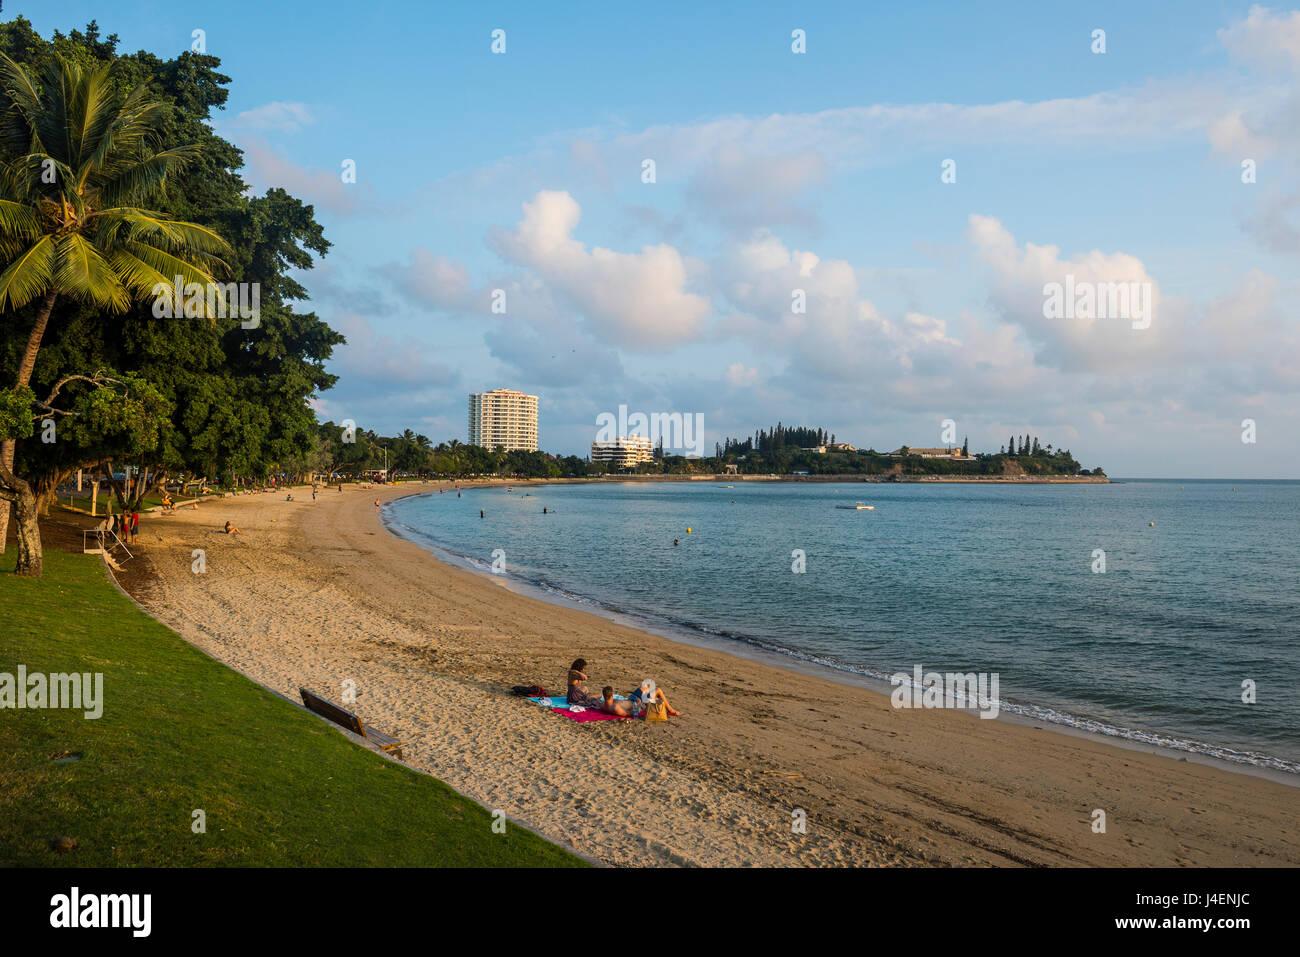 Baie des Citrons beach, Noumea, New Caledonia, Pacific - Stock Image